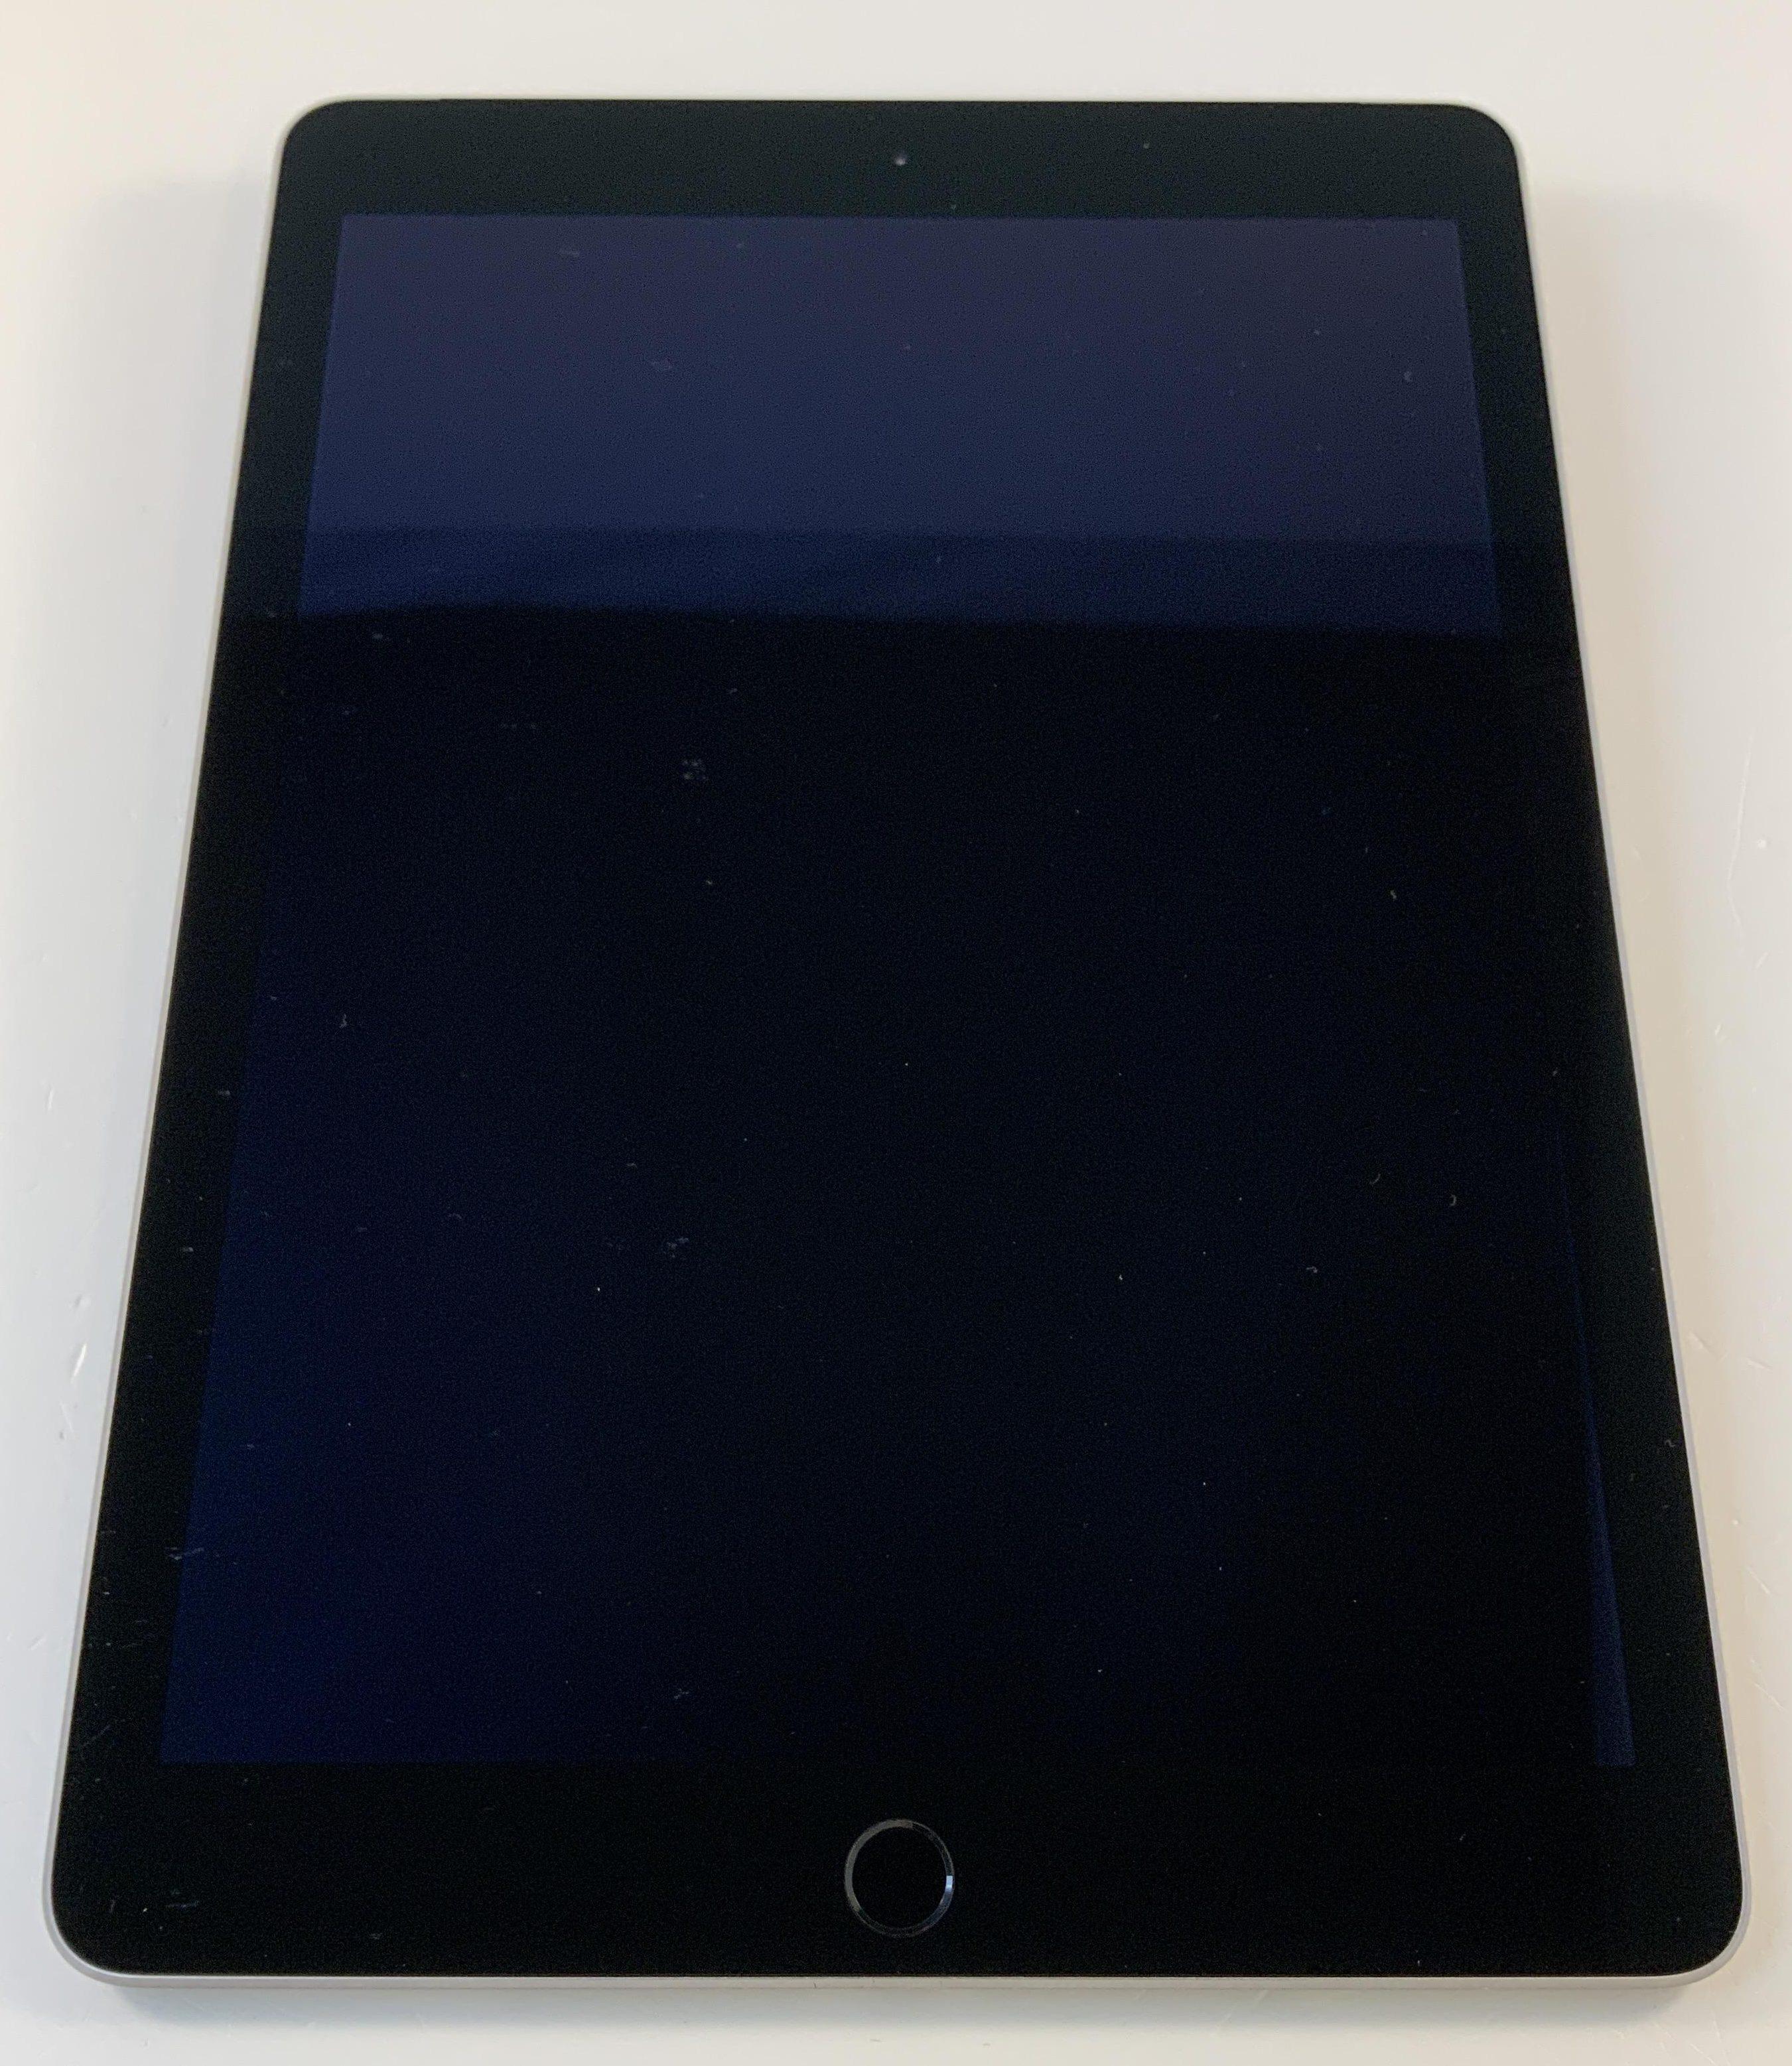 iPad Air 2 Wi-Fi + Cellular 128GB, 128GB, Space Gray, bild 1